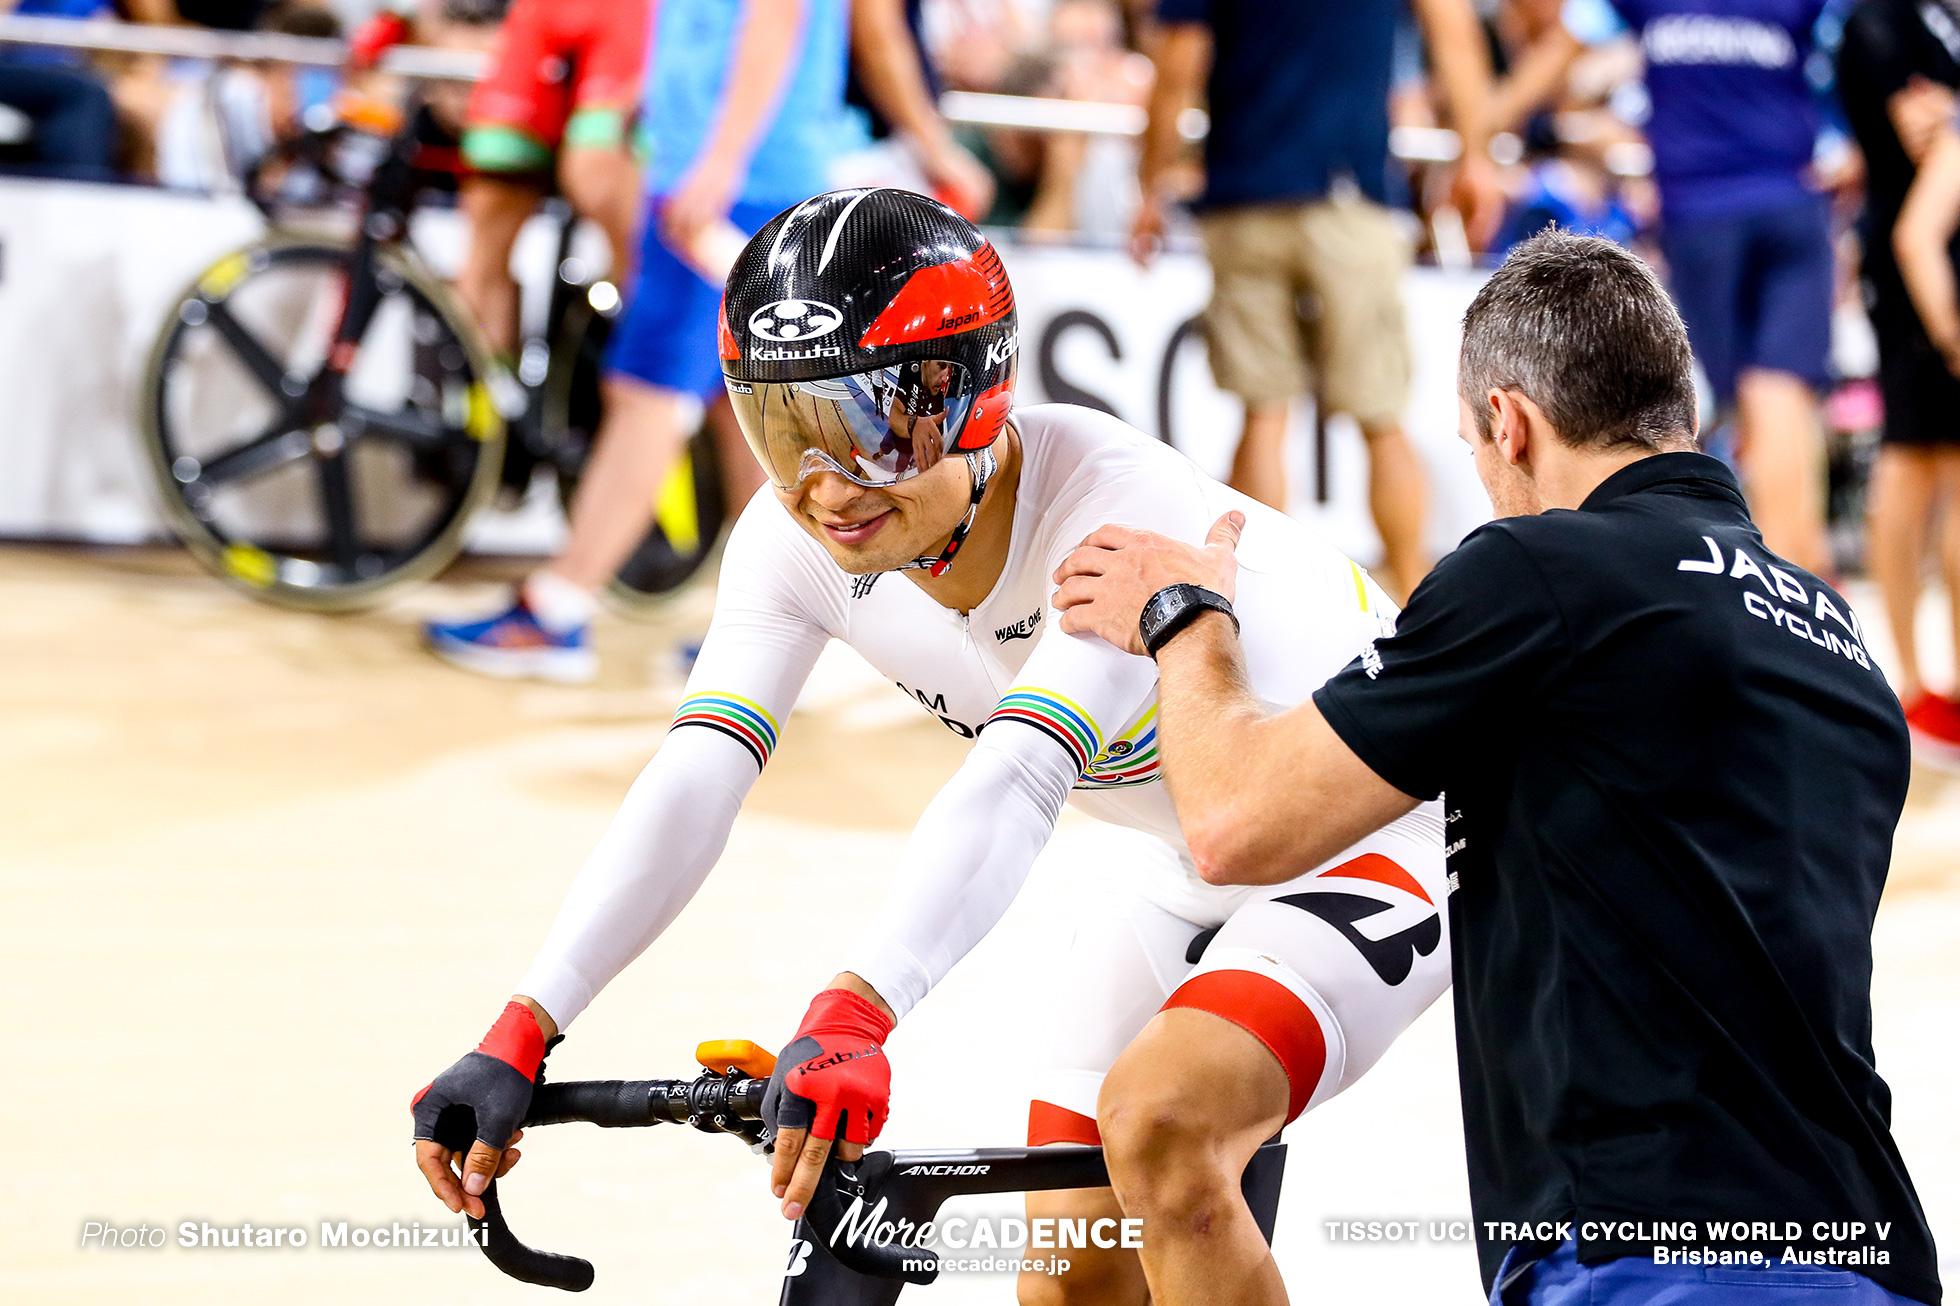 Men's Omnium / Elimination / TISSOT UCI TRACK CYCLING WORLD CUP V, Brisbane, Australia, 橋本英也